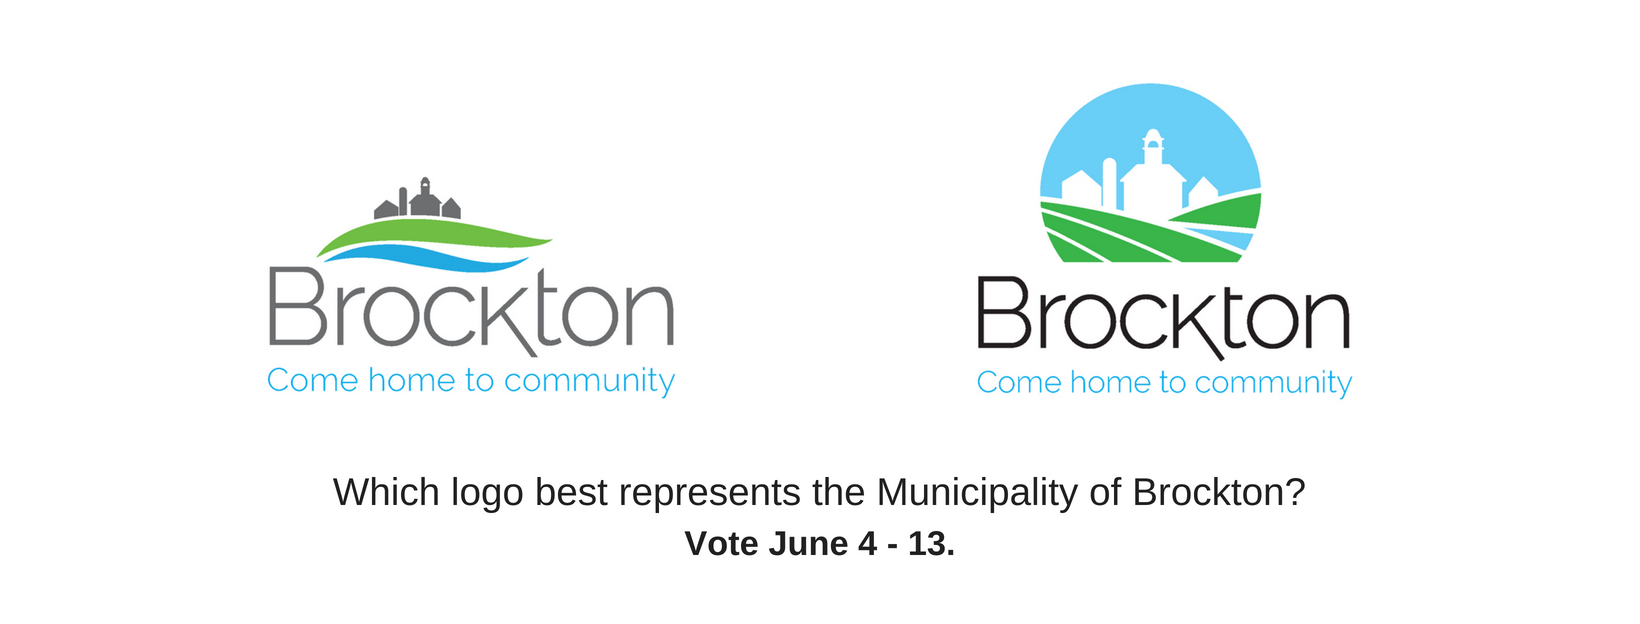 Brockton-logo-survey-FB-cover-desktop